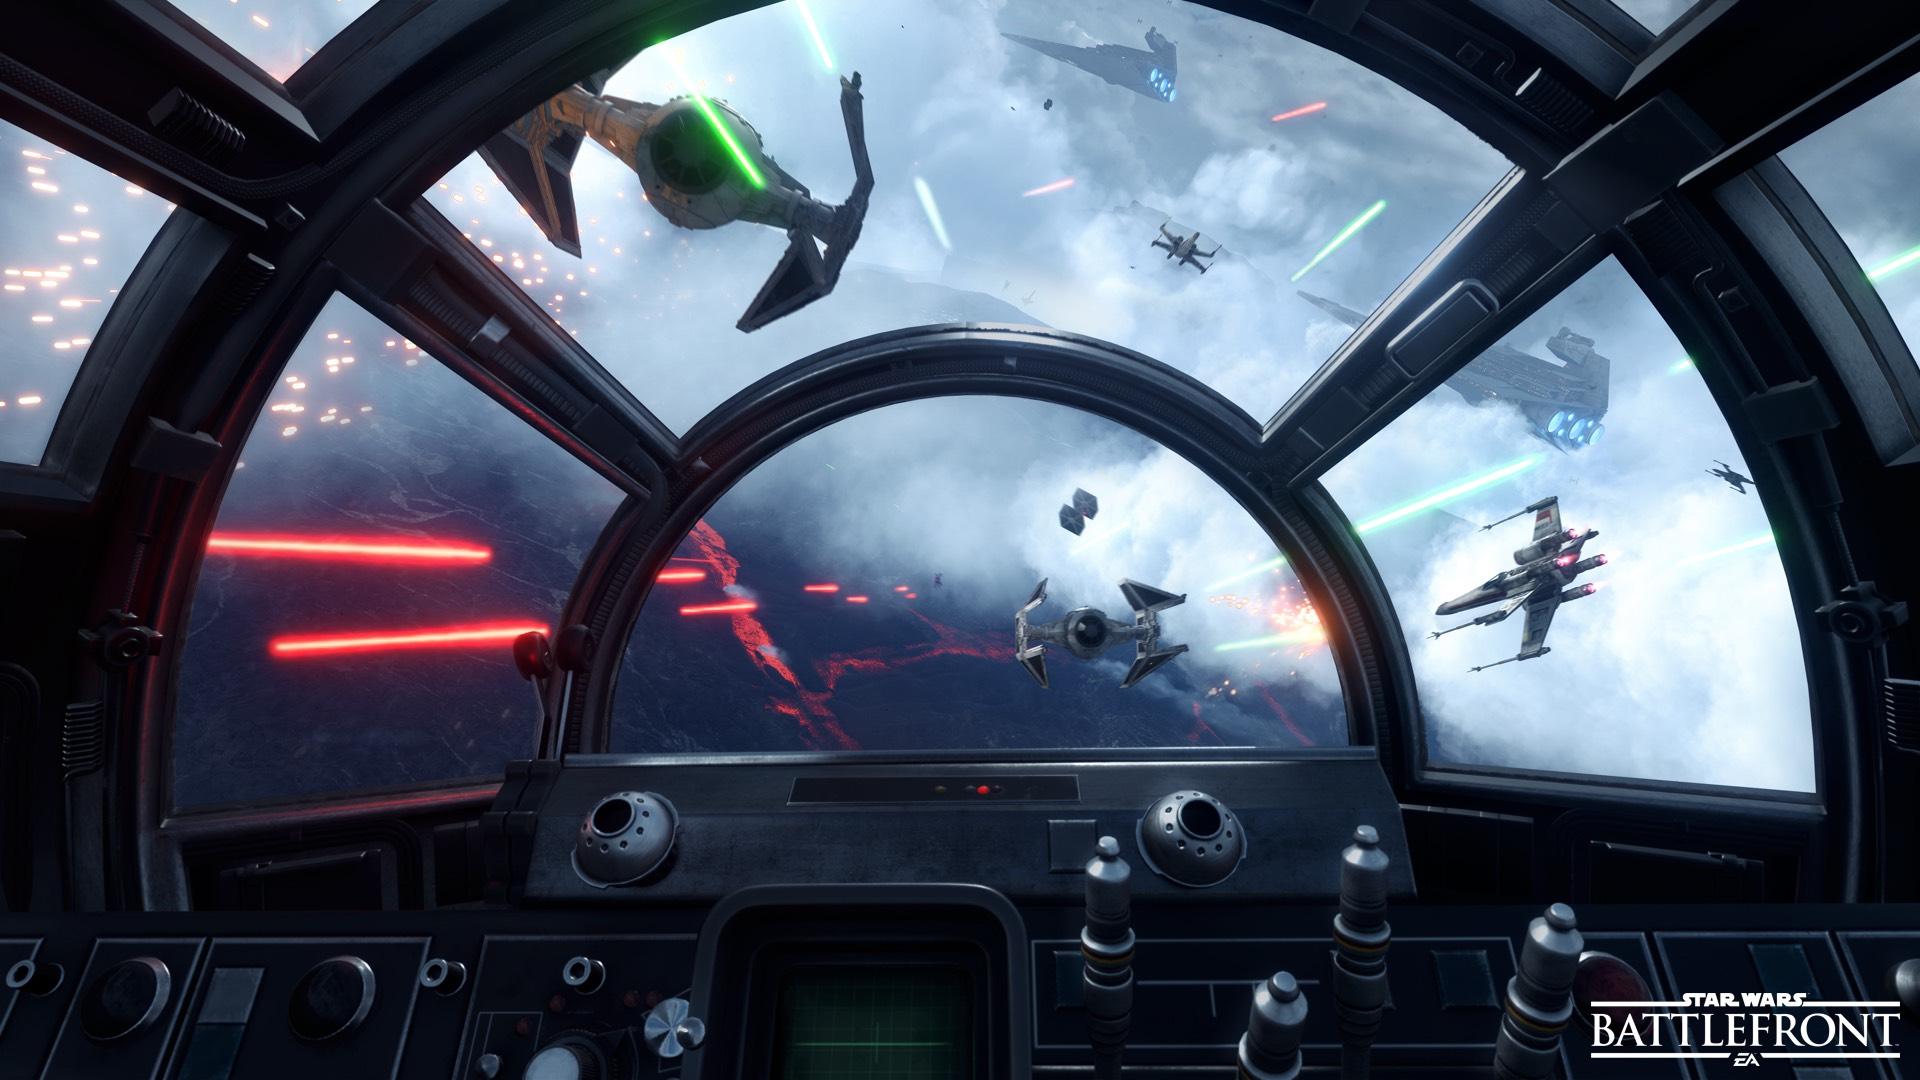 Star Wars Battlefront Gamescom Wallpapers   Star Wars   Official EA 1920x1080